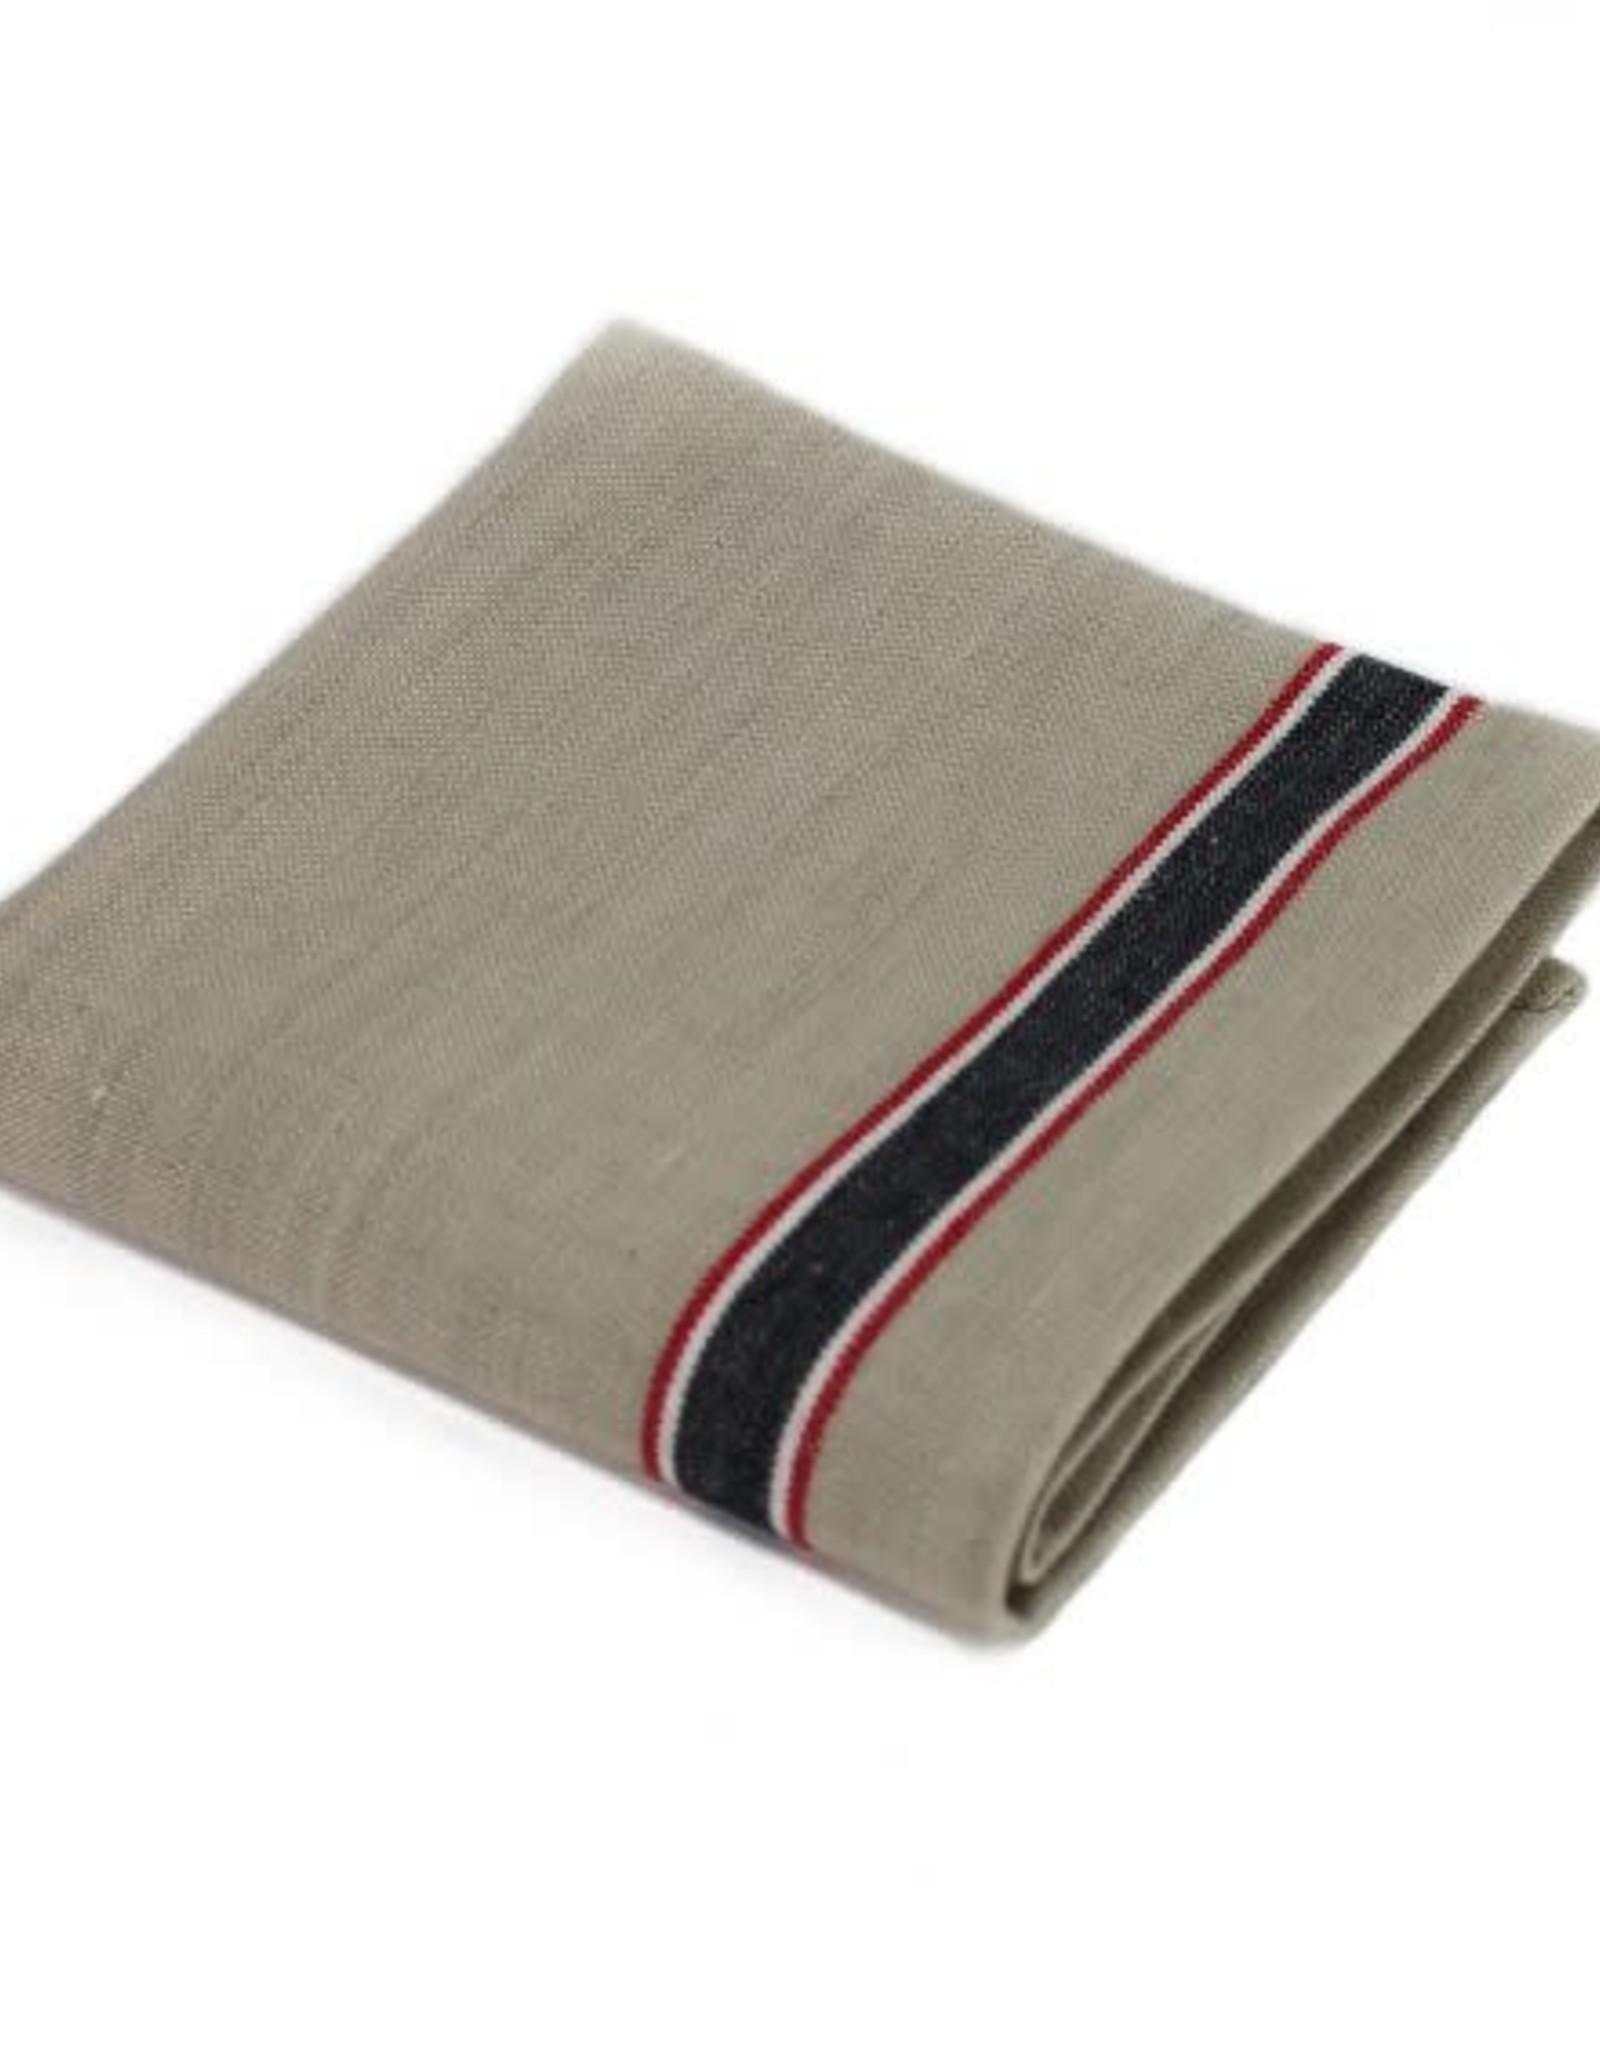 TOWEL DISH FRENCH LAUNDRY BLACK